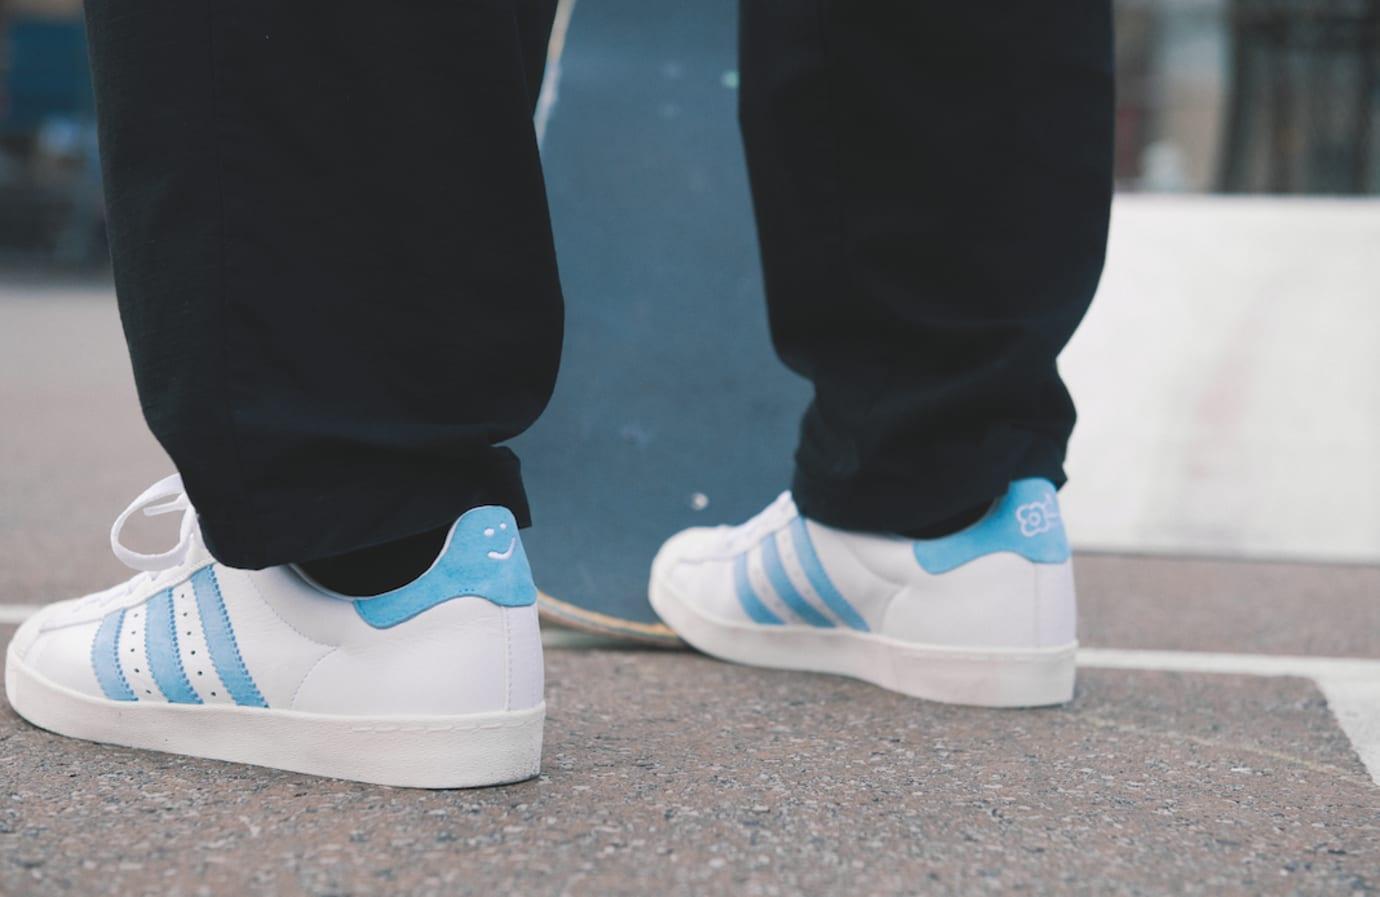 Adidas x Krooked Superstar Vulc Mark Gonzales